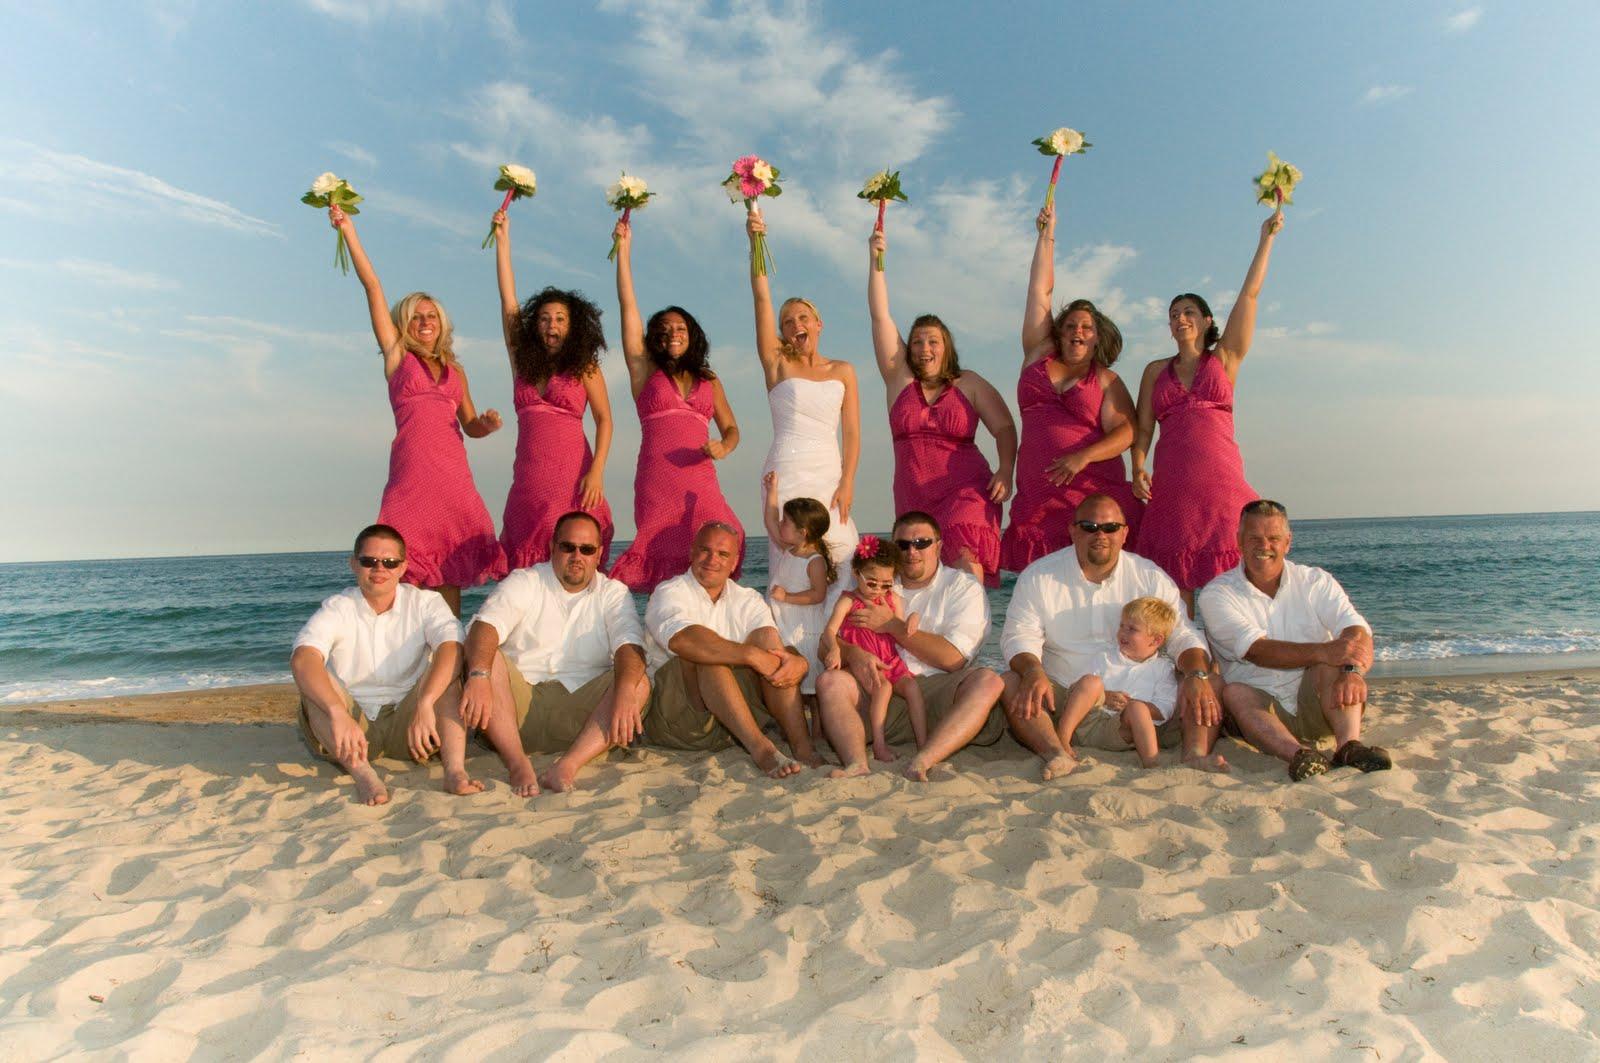 Whiteazalea destination dresses beautiful beach for Destination wedding dresses for guests